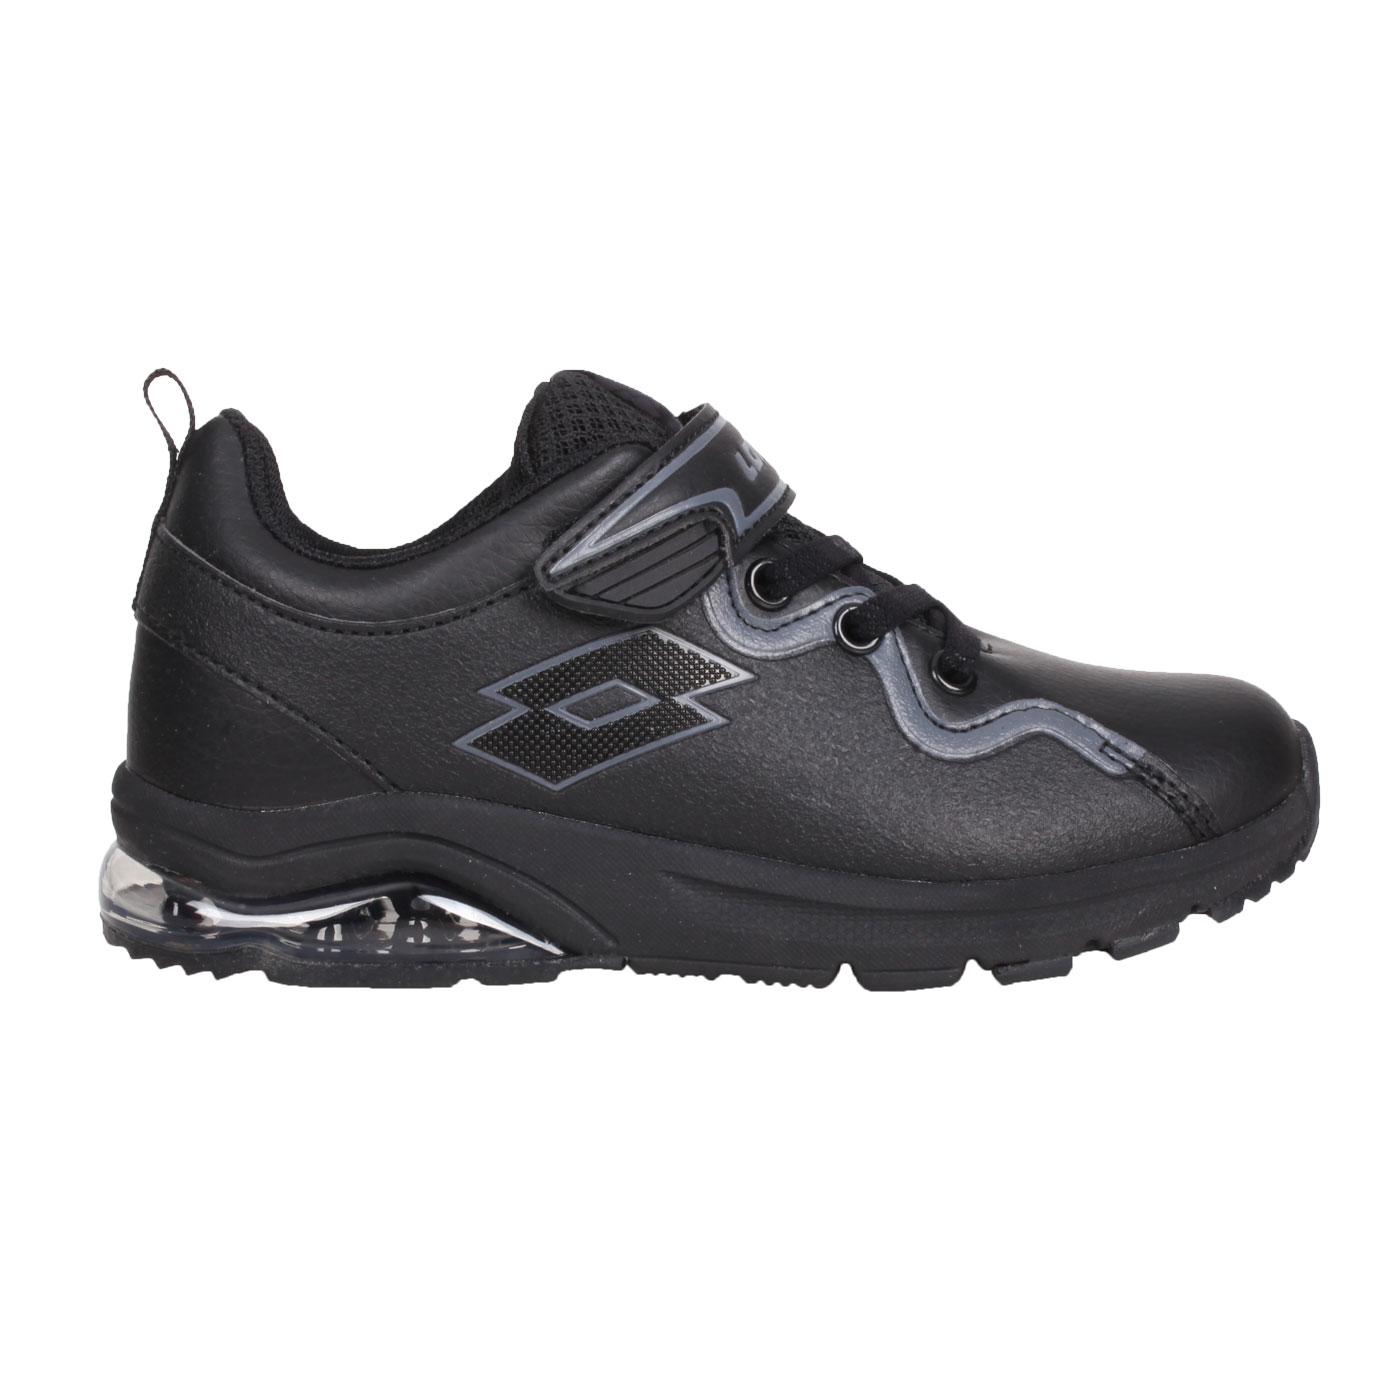 LOTTO 中童透氣跑鞋 LT1AKR3120 - 黑灰